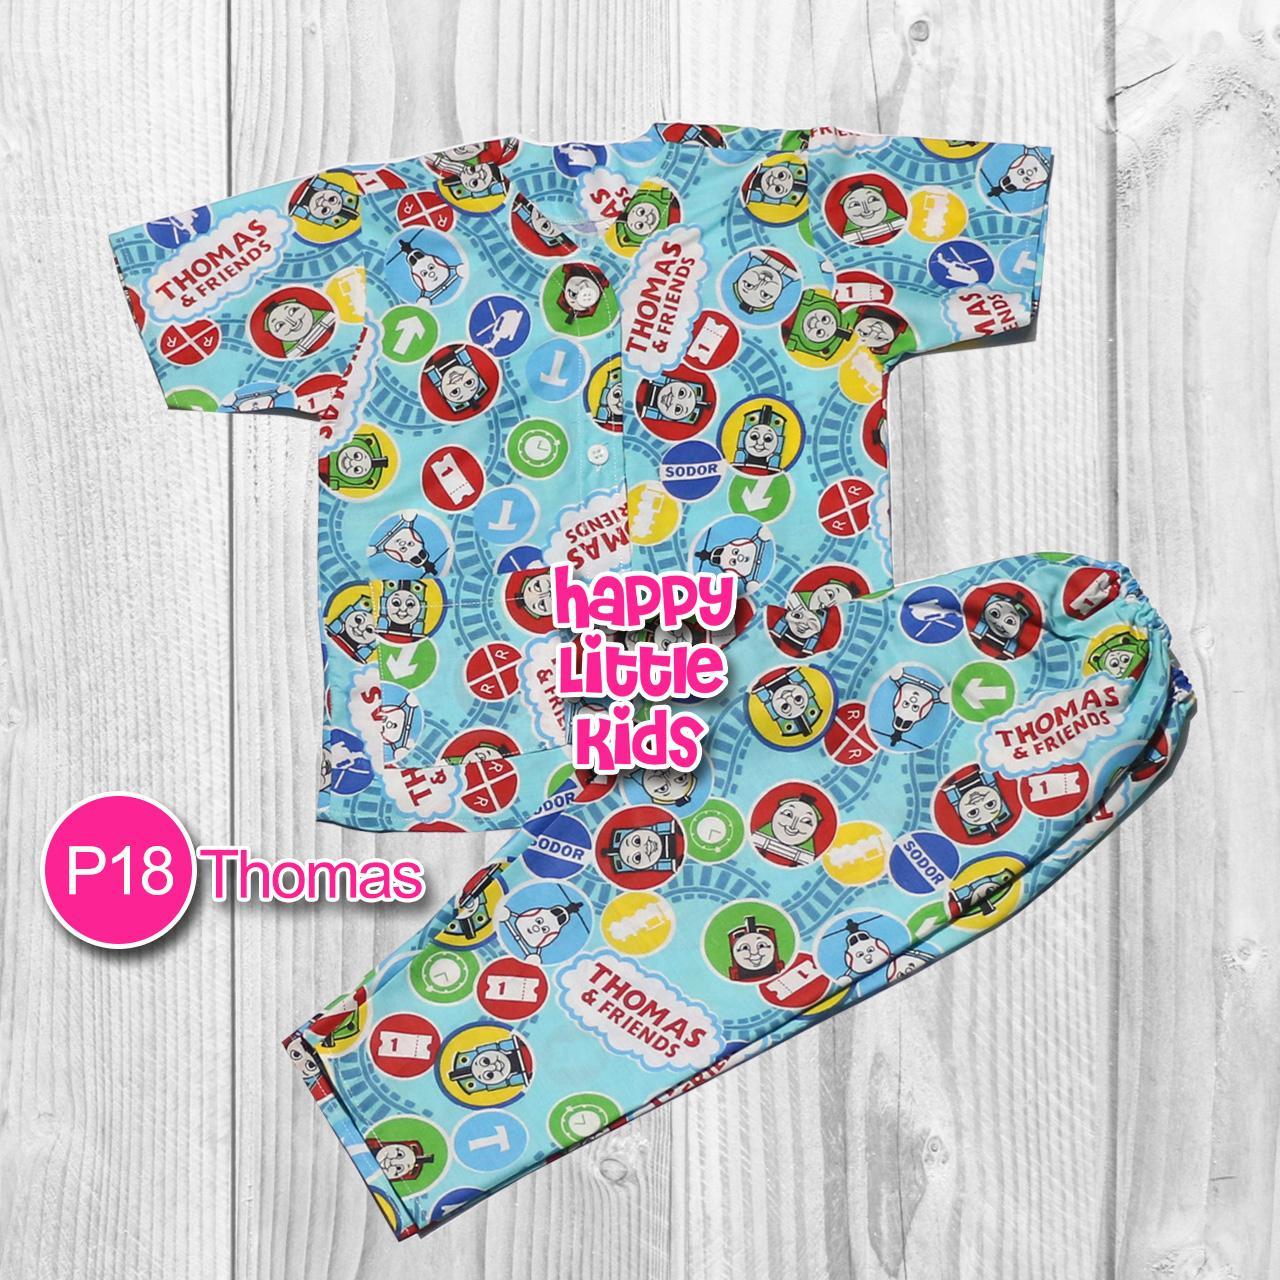 Baju Tidur Piyama Anak 1 sd 6 Tahun Laki-Laki Perempuan P18 BIDENBUY